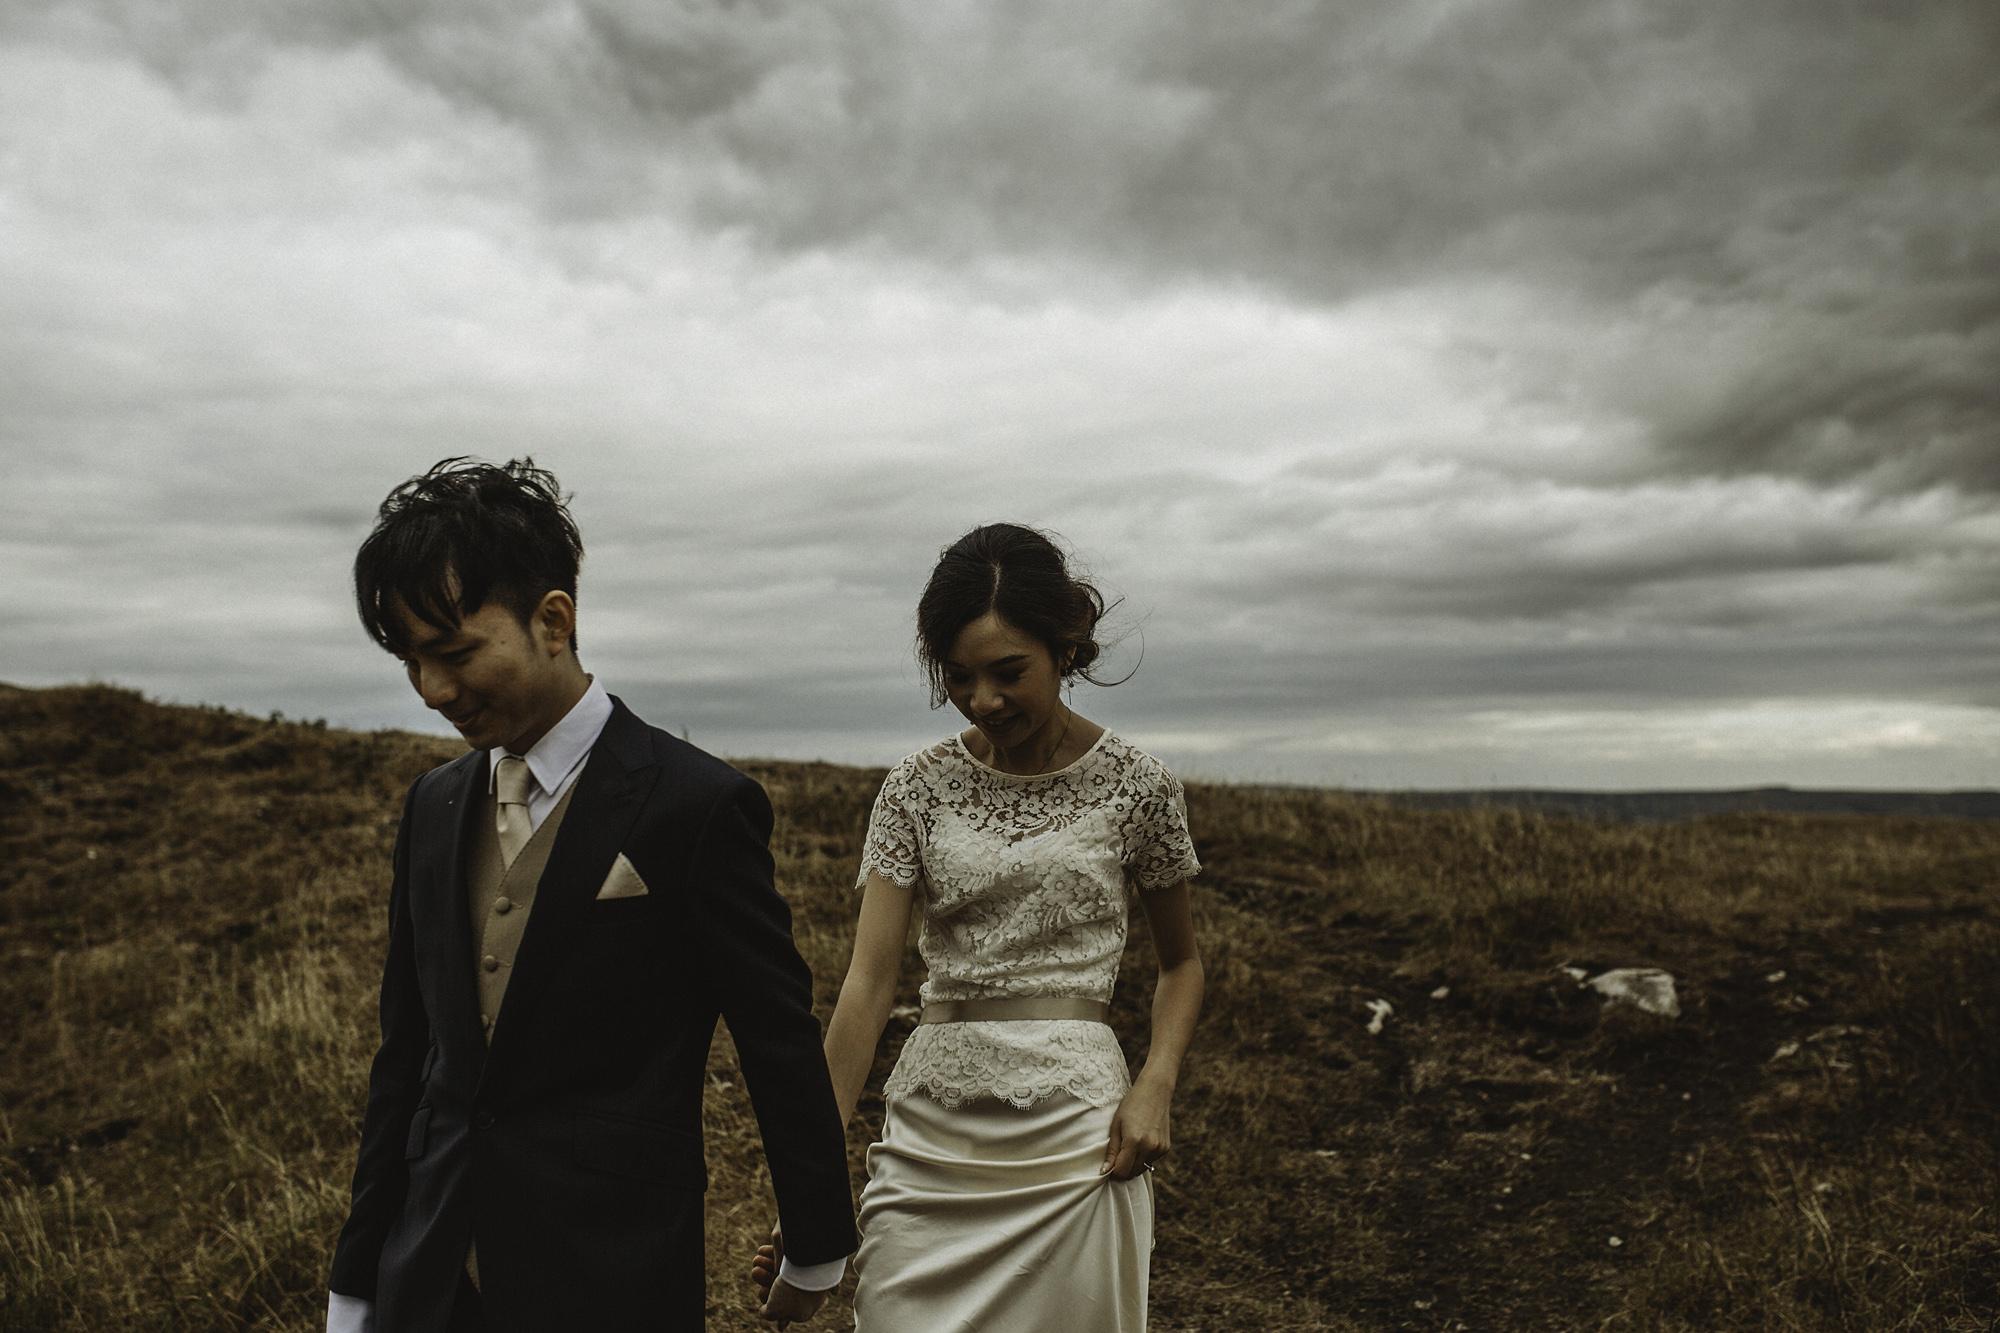 Kate-Beaumont-Wedding-Dress-Bridal-Separates-Peak-District-Shoot-18.jpg